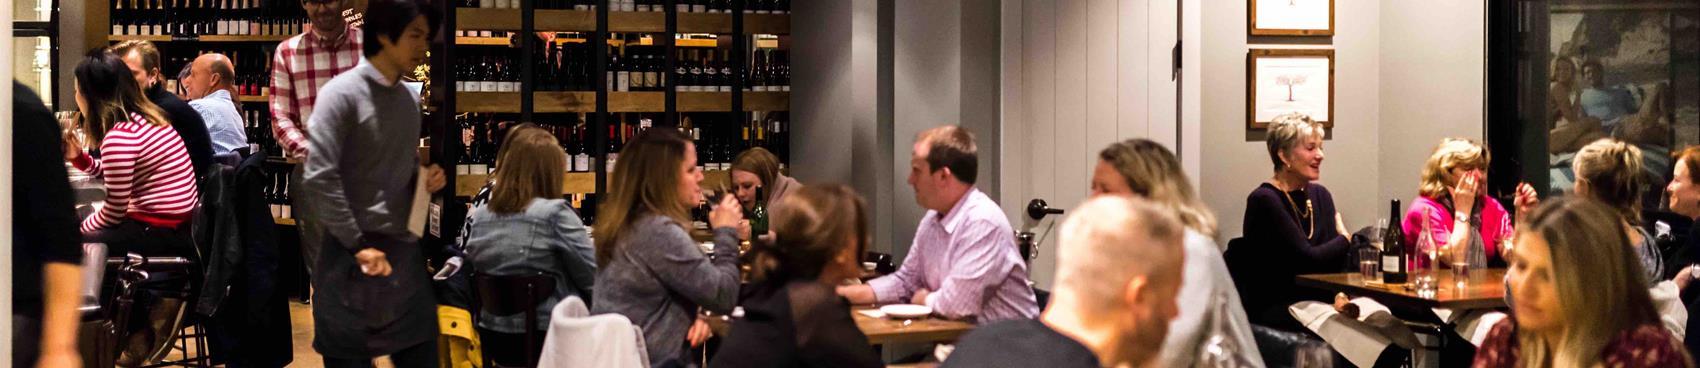 Compline Wine Bar & Restaurant